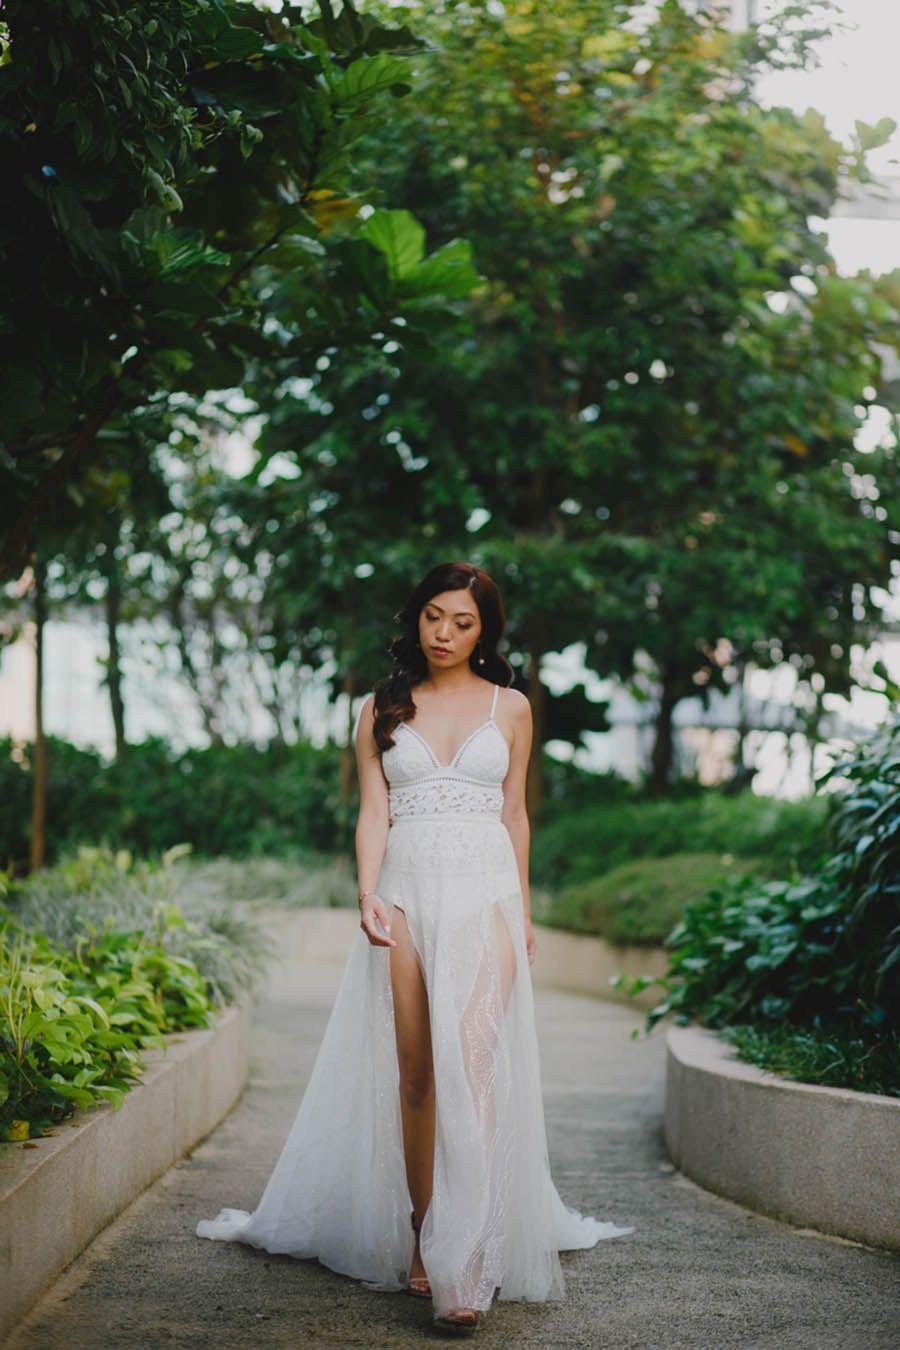 Epingle Sur Wedding Gowns And Dresses [ 1350 x 900 Pixel ]